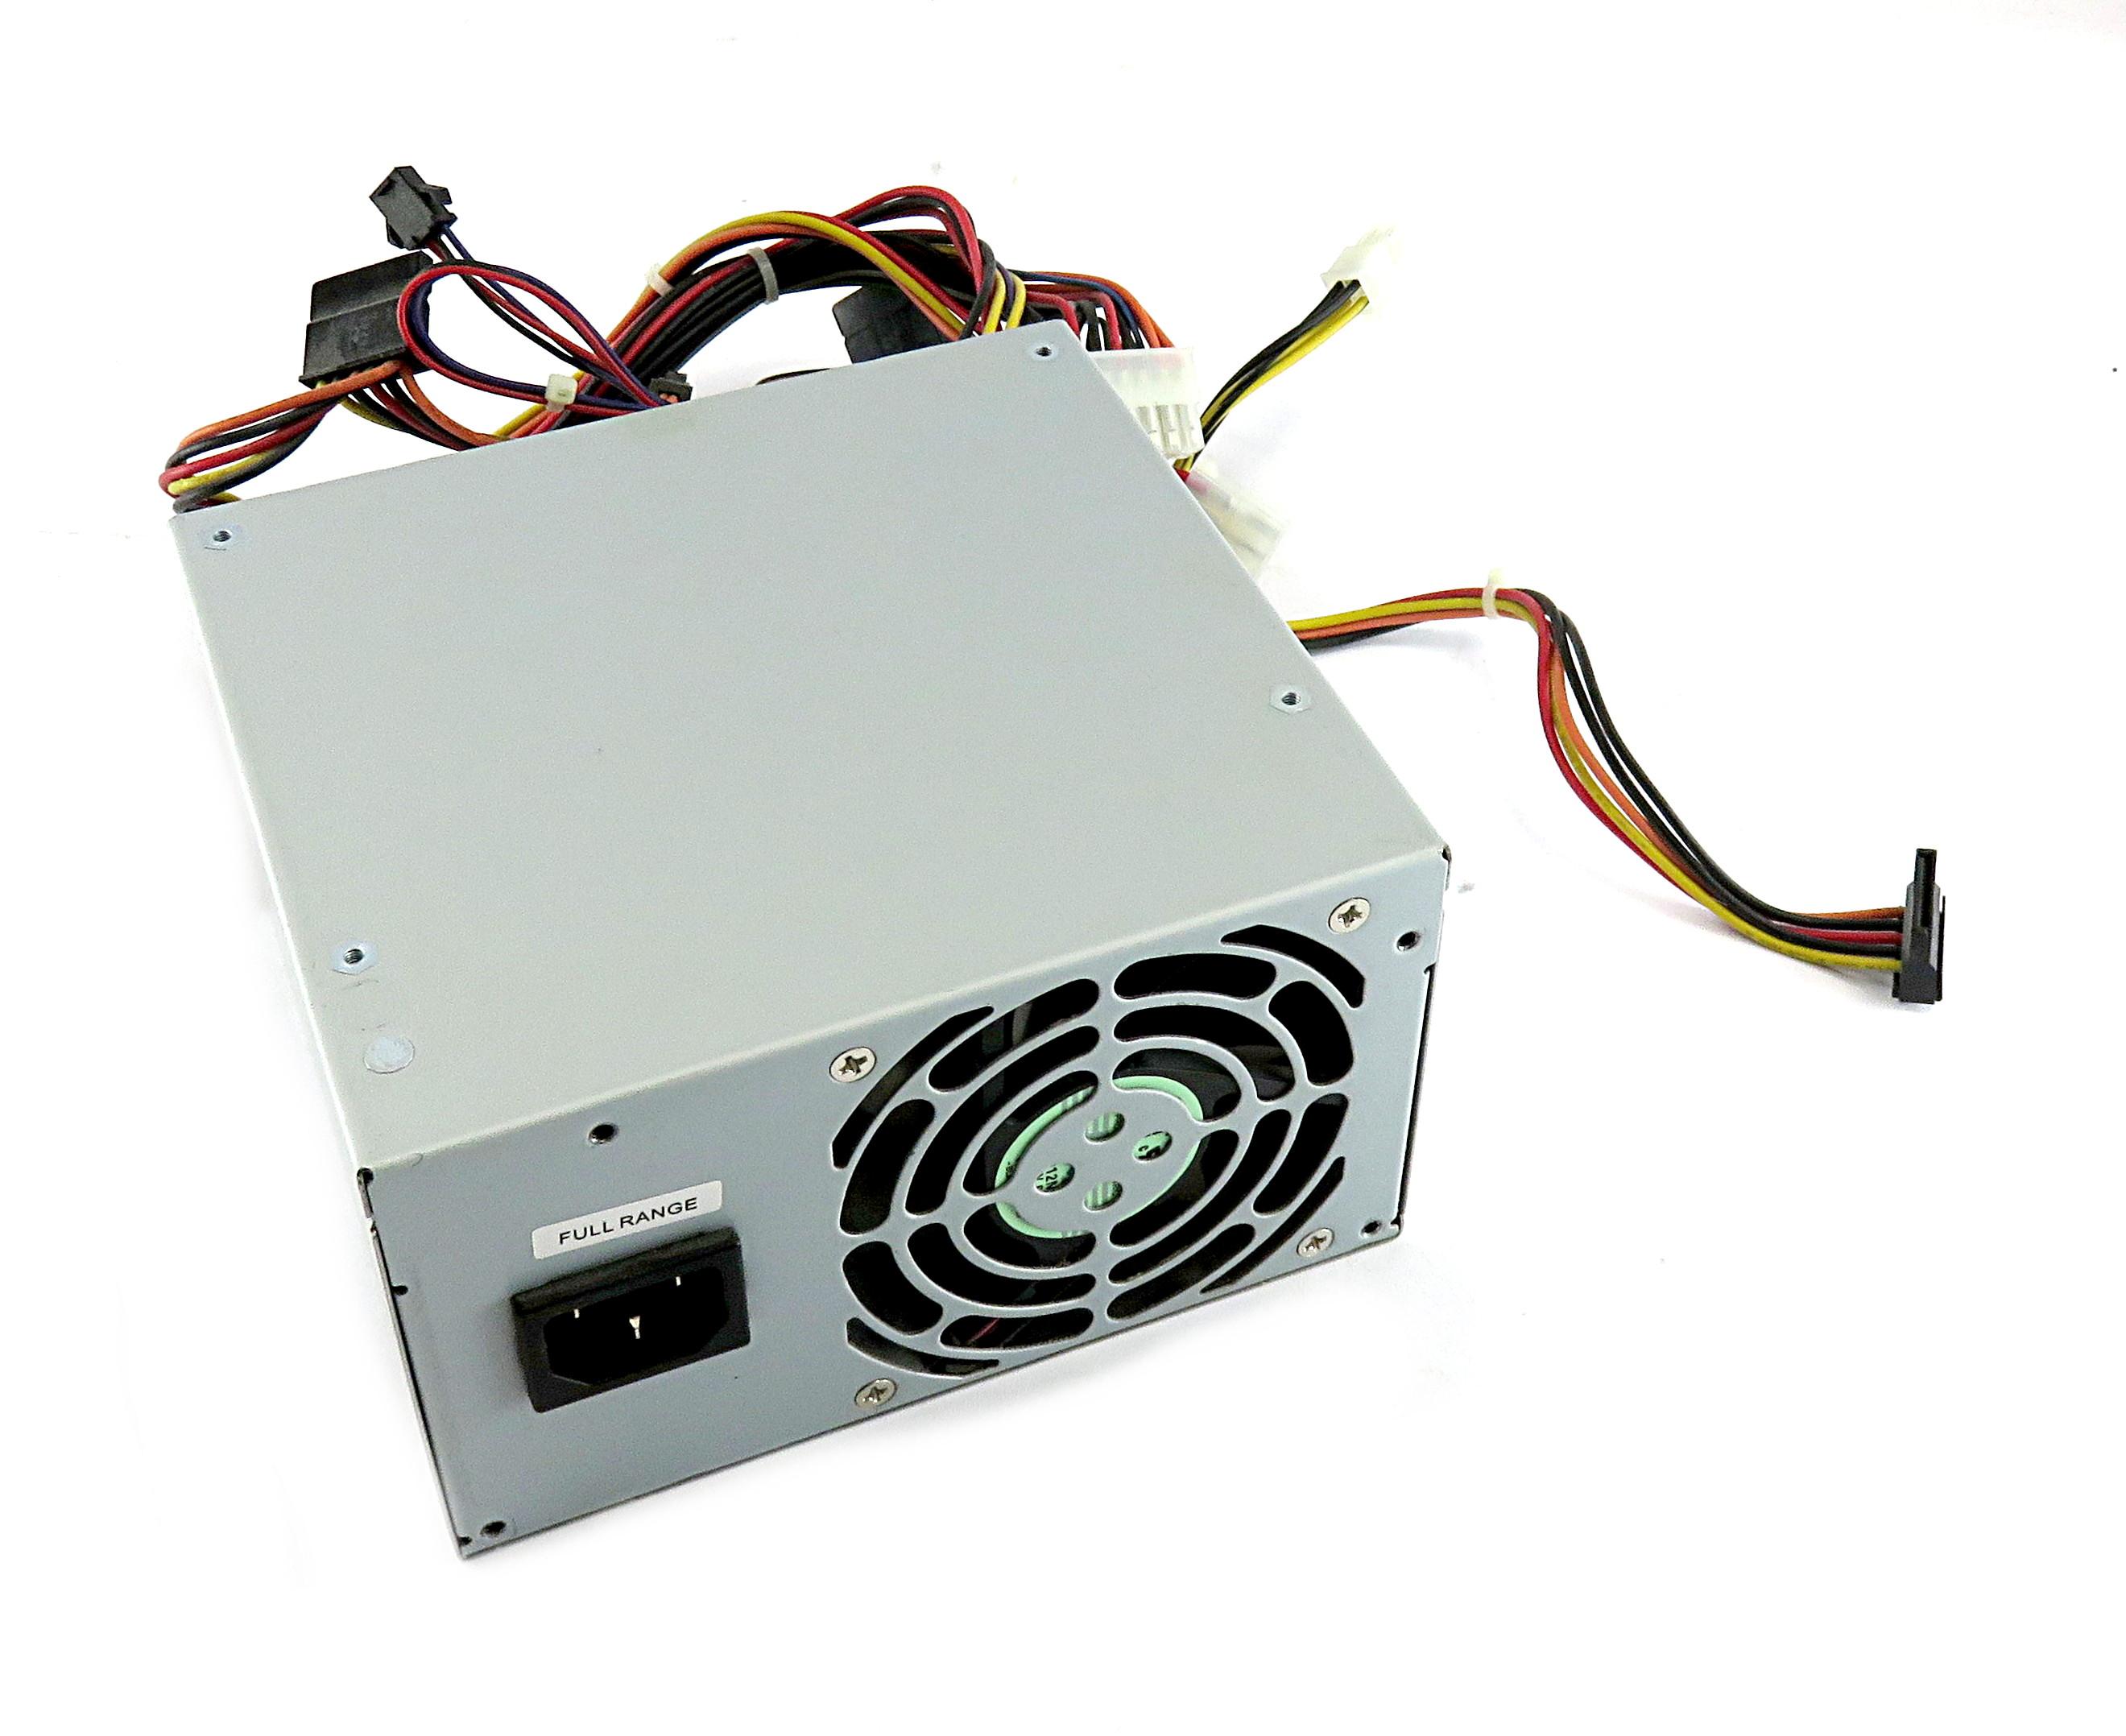 Lenovo 45J9431 280W 24-Pin ATX Power Supply FSP280-50EPA f/ ThinkCentre PC